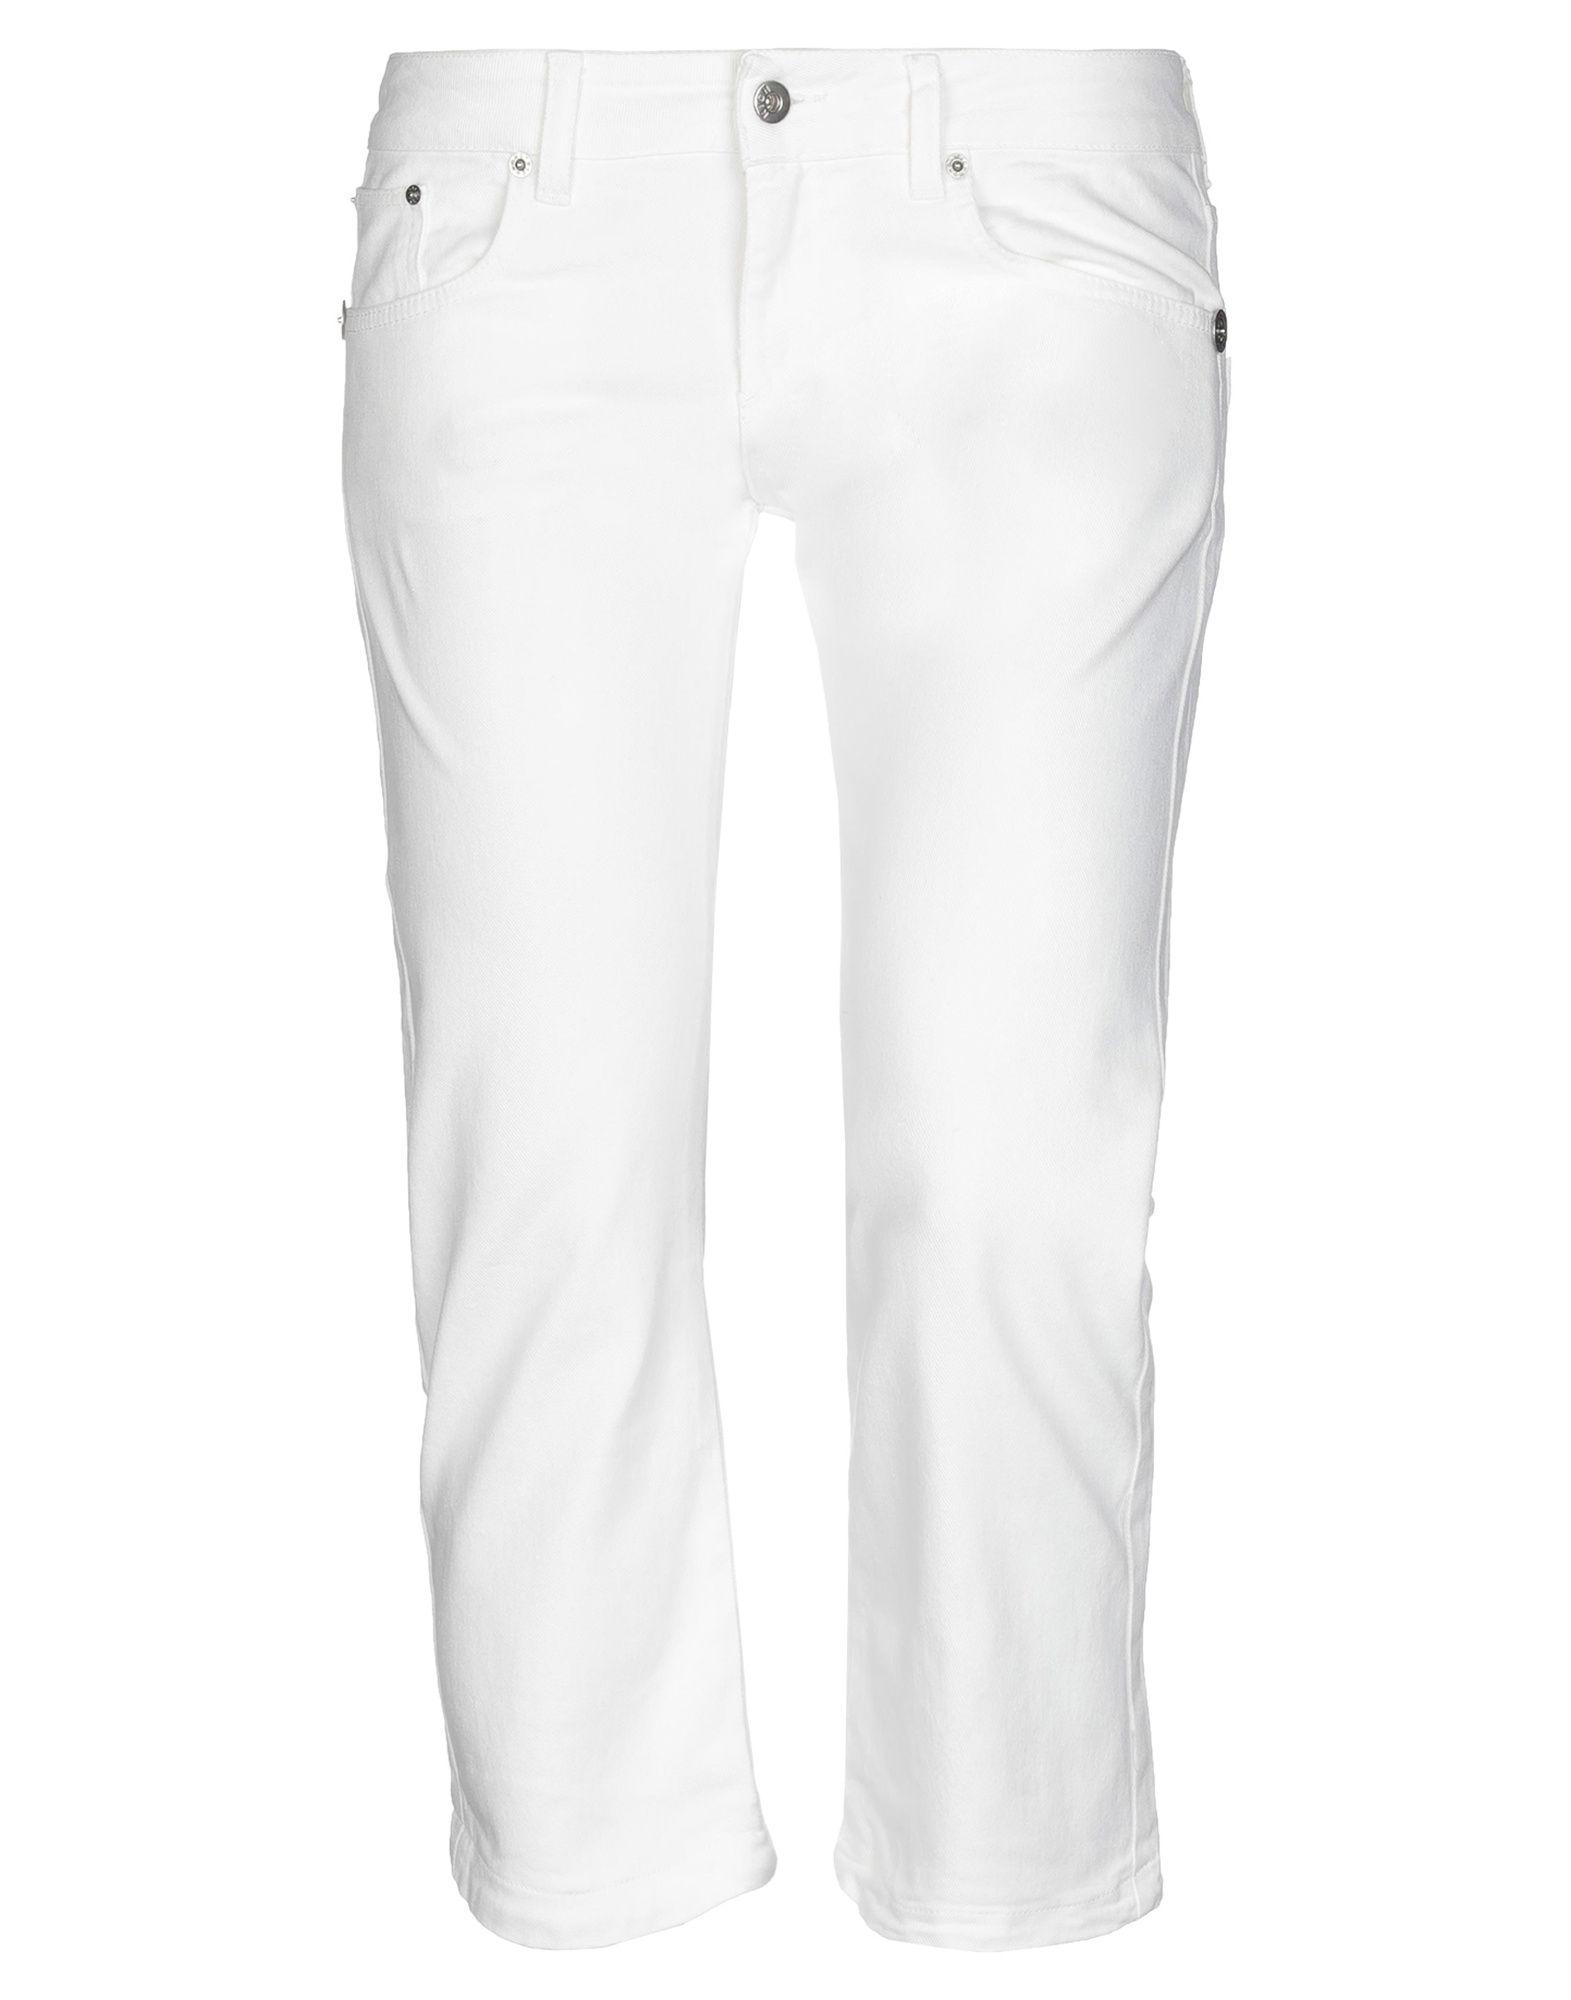 RICHMOND DENIM Джинсовые брюки-капри капри john richmond бриджи и капри укороченные